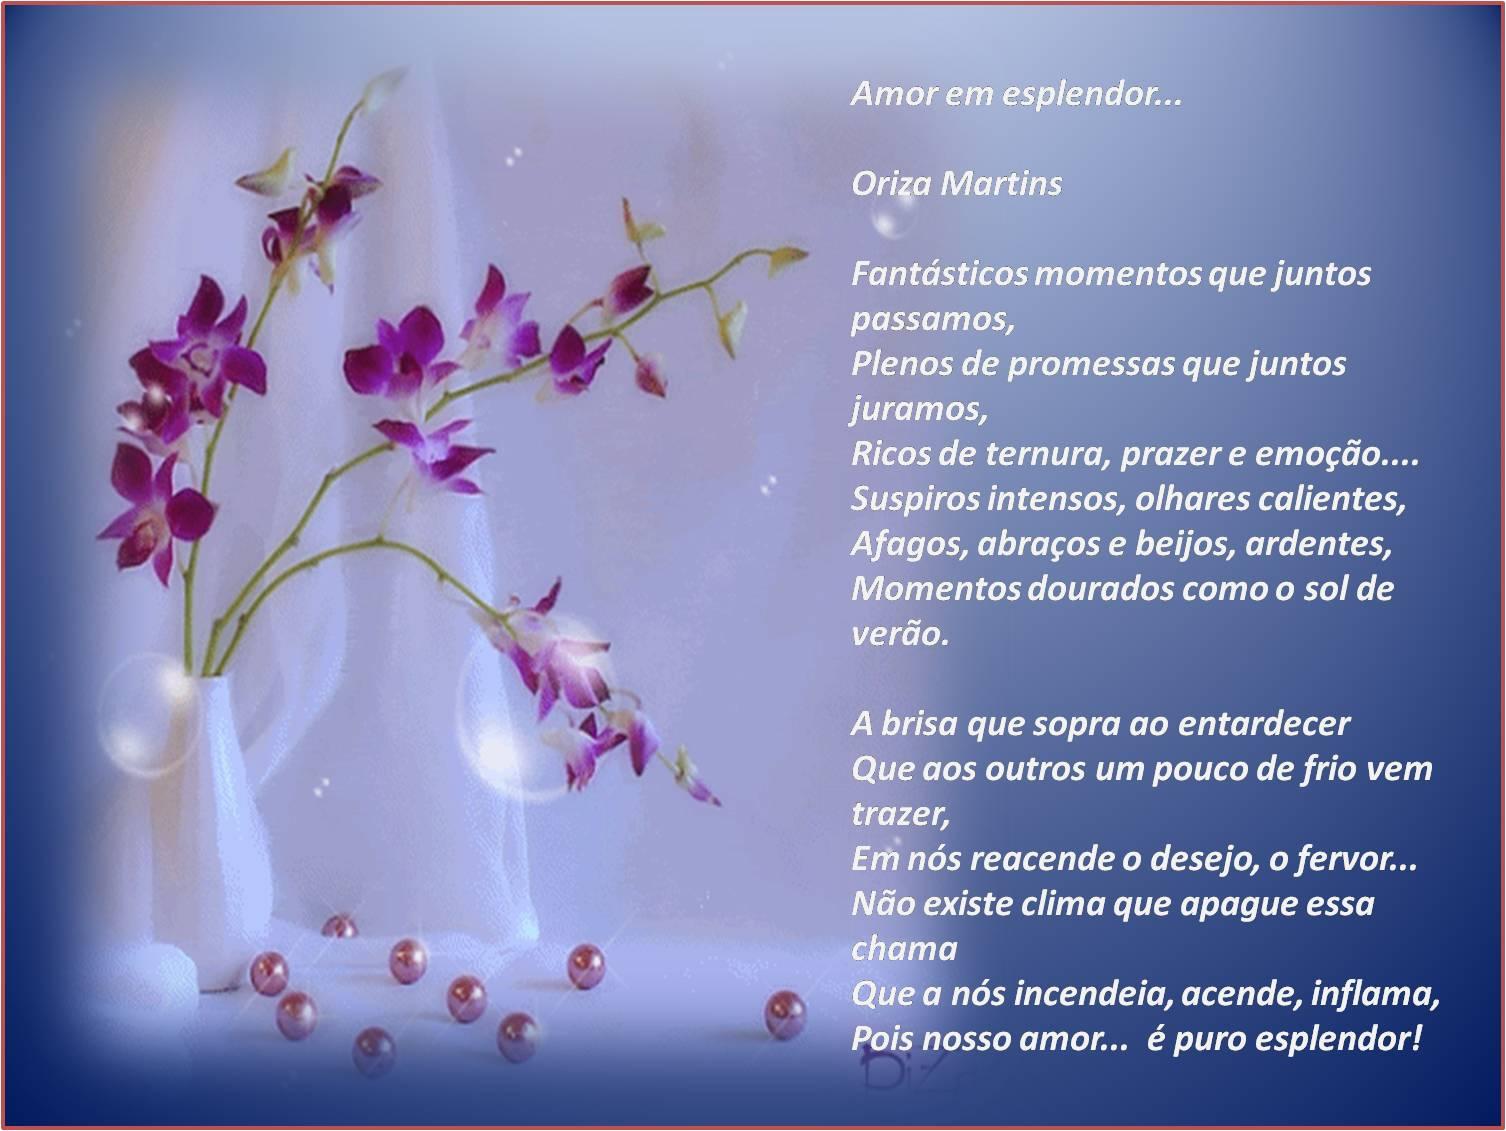 Poemas con imagenes AMOR+EM+ESPLENDOR